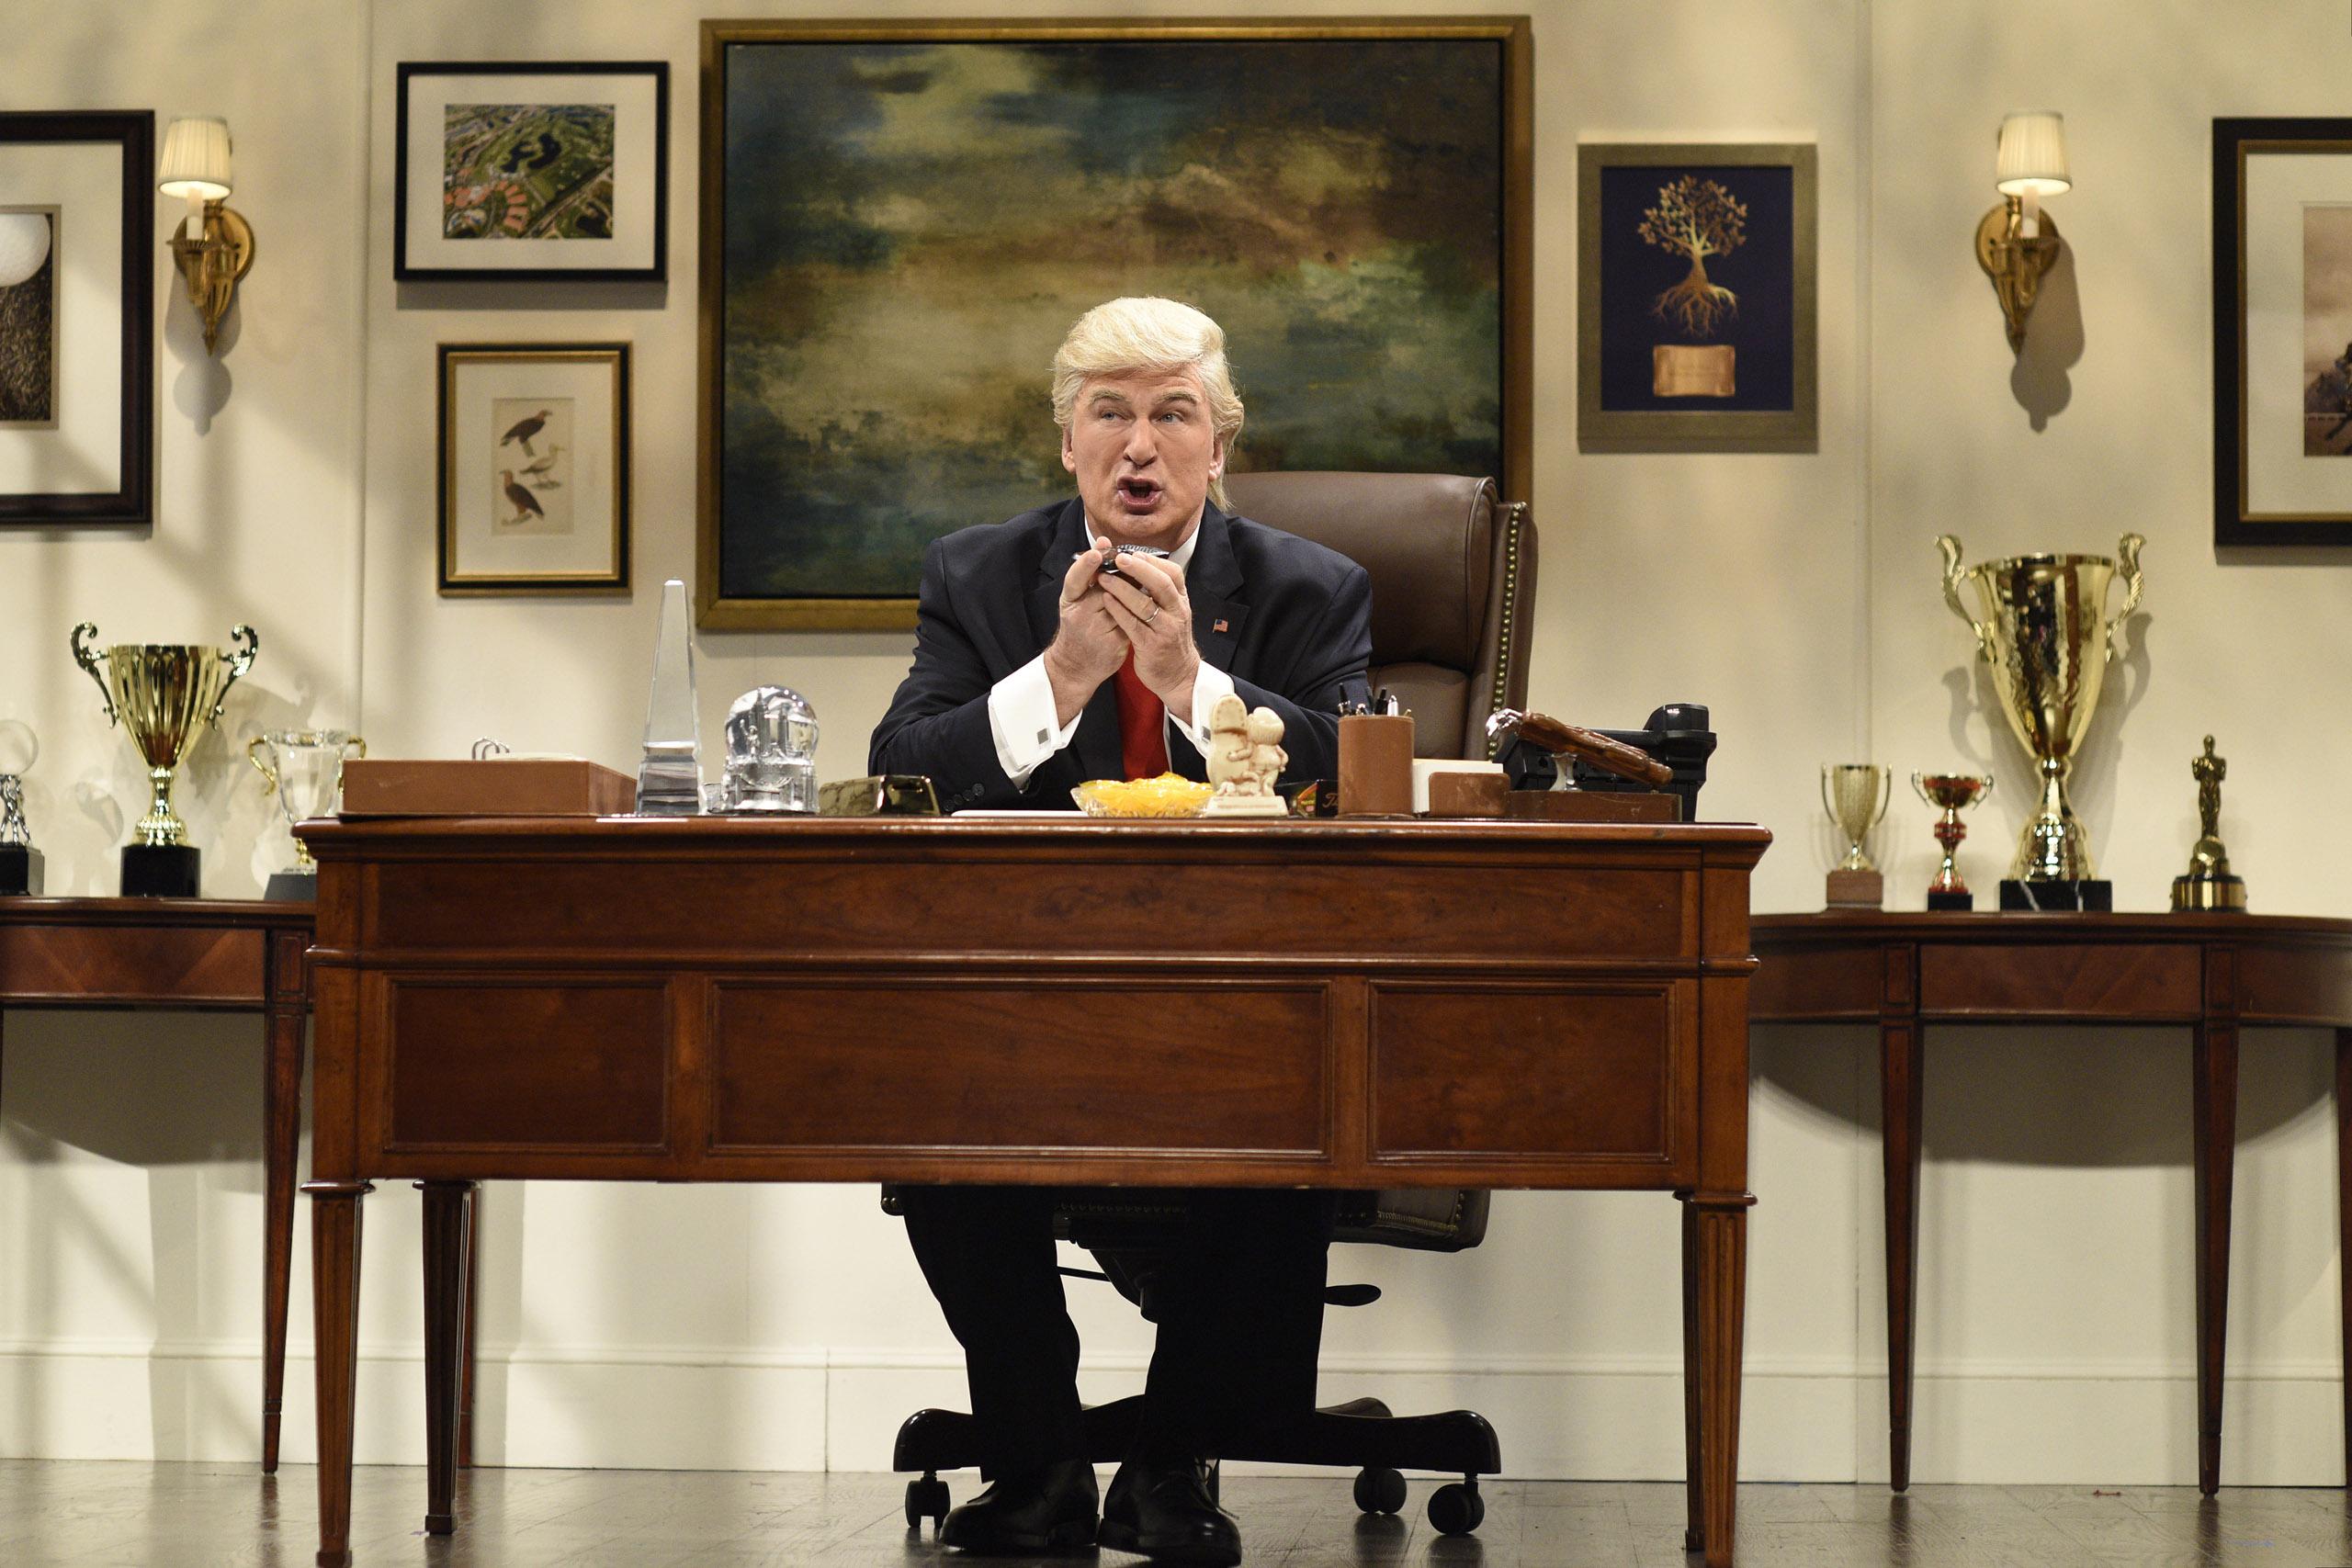 Alec Baldwin as Donald Trump during the  Donald Trump Prepares Cold Open  sketch on Nov. 19, 2016